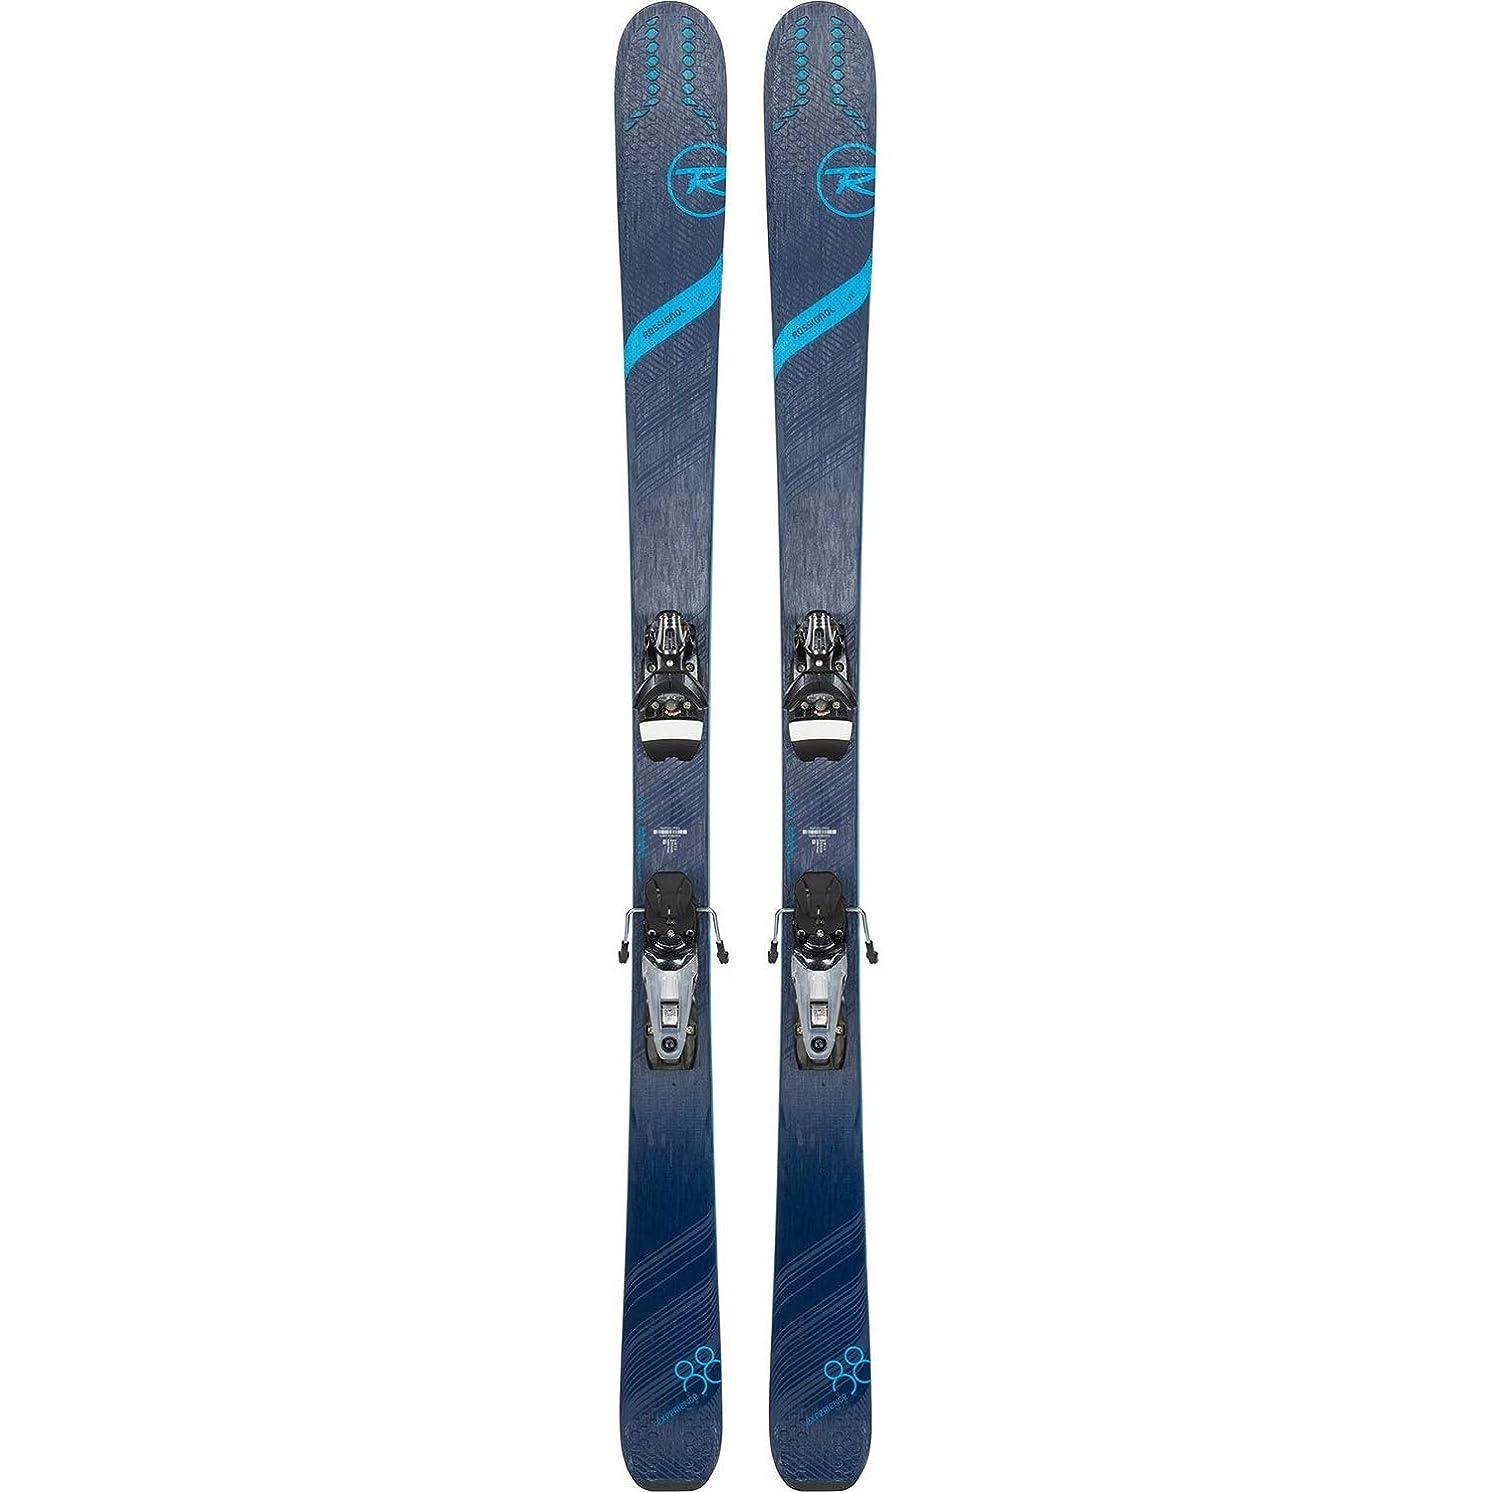 Rossignol 2019 Experience 88 Ti 152cm Womens Skis w/NX 12 Dual Bindings